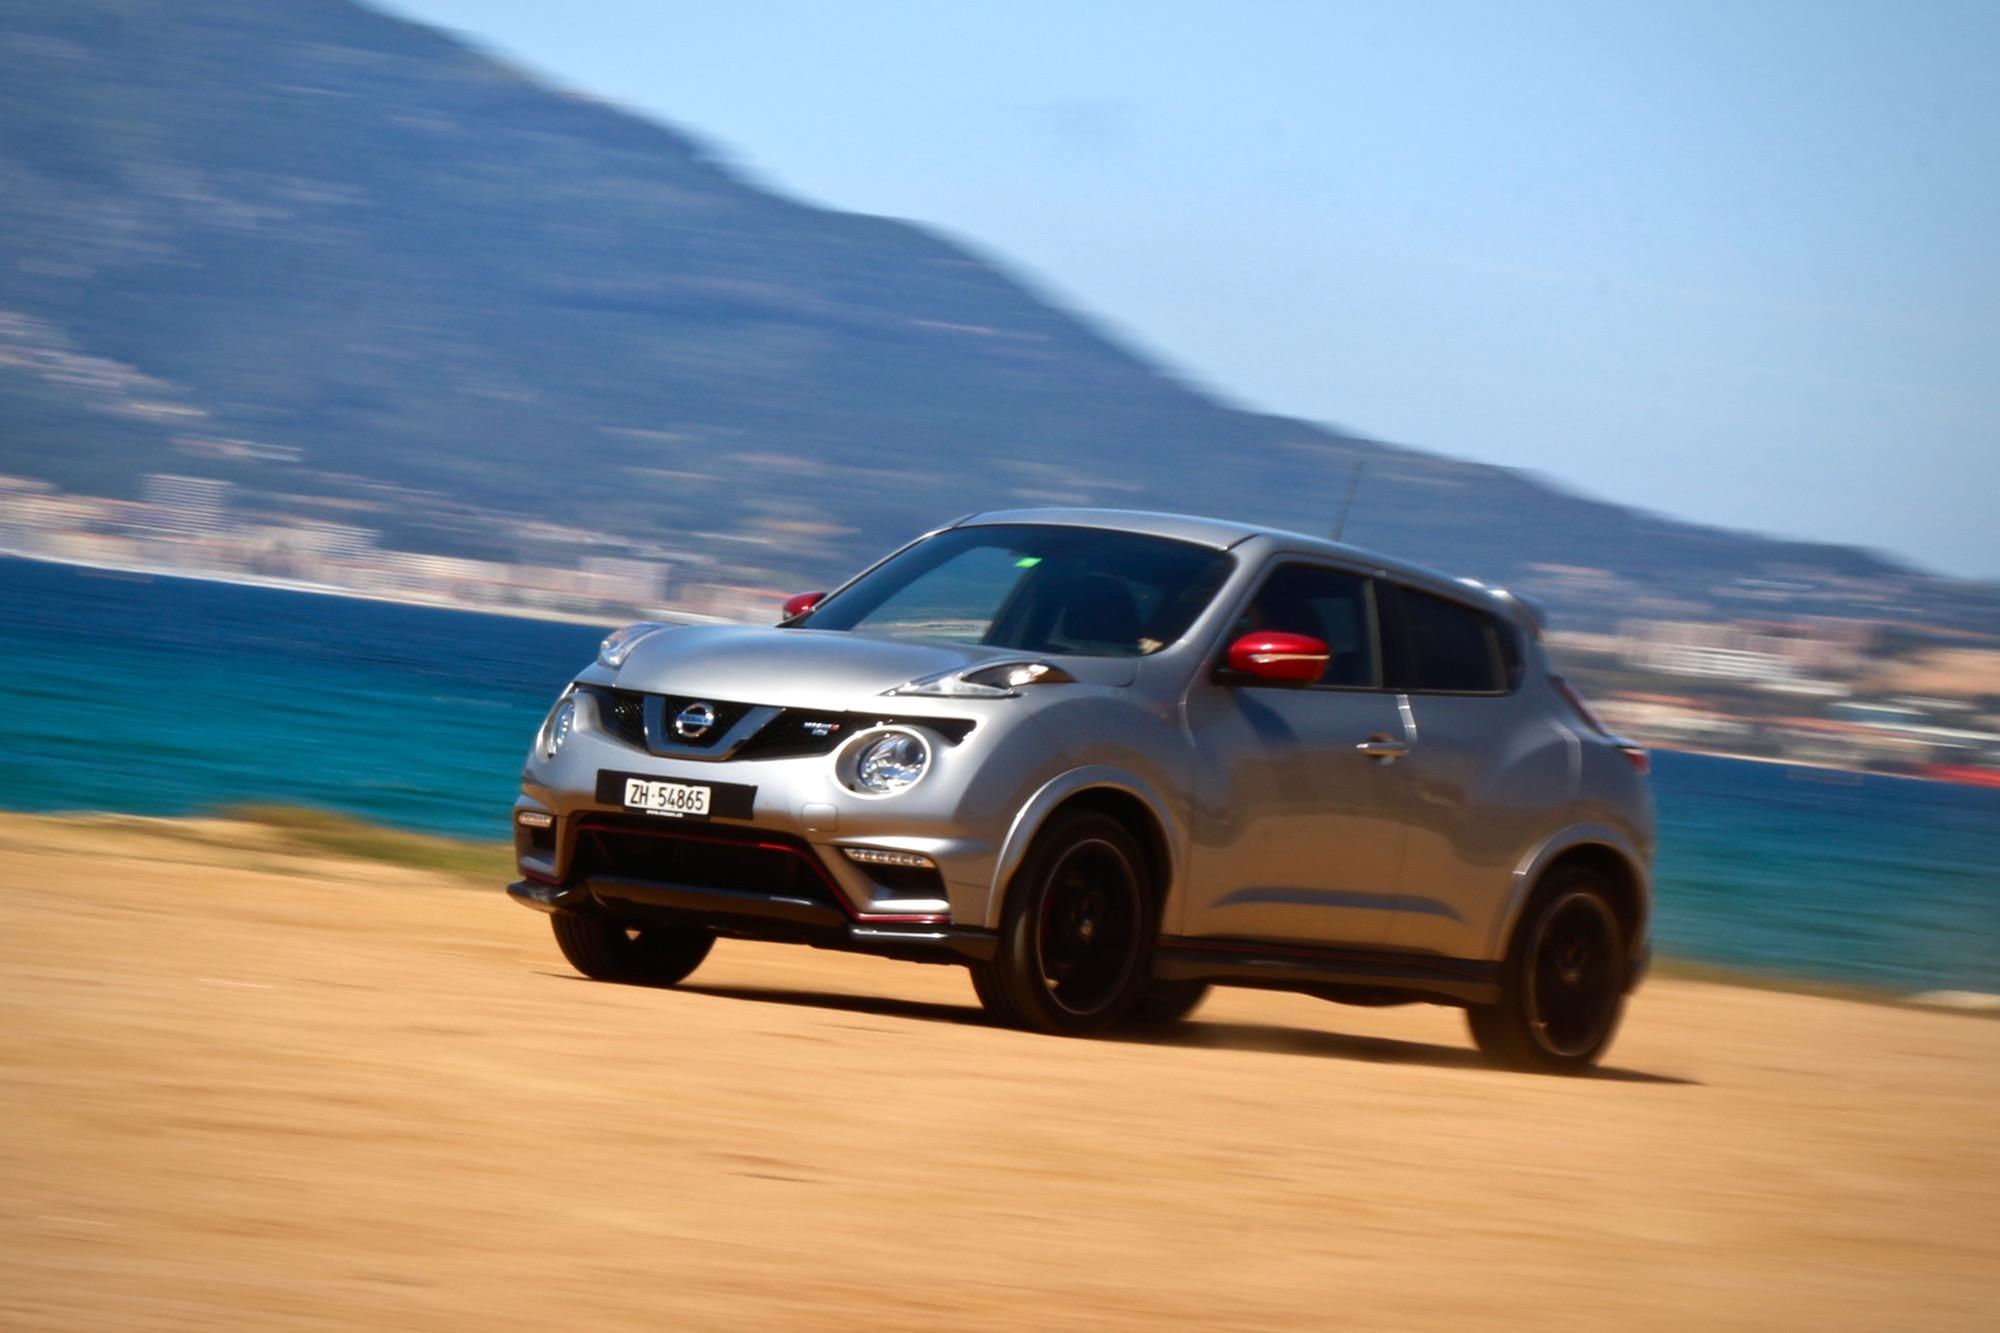 Abgefahren: Mit dem Nissan Juke Nismo RS auf Korsika